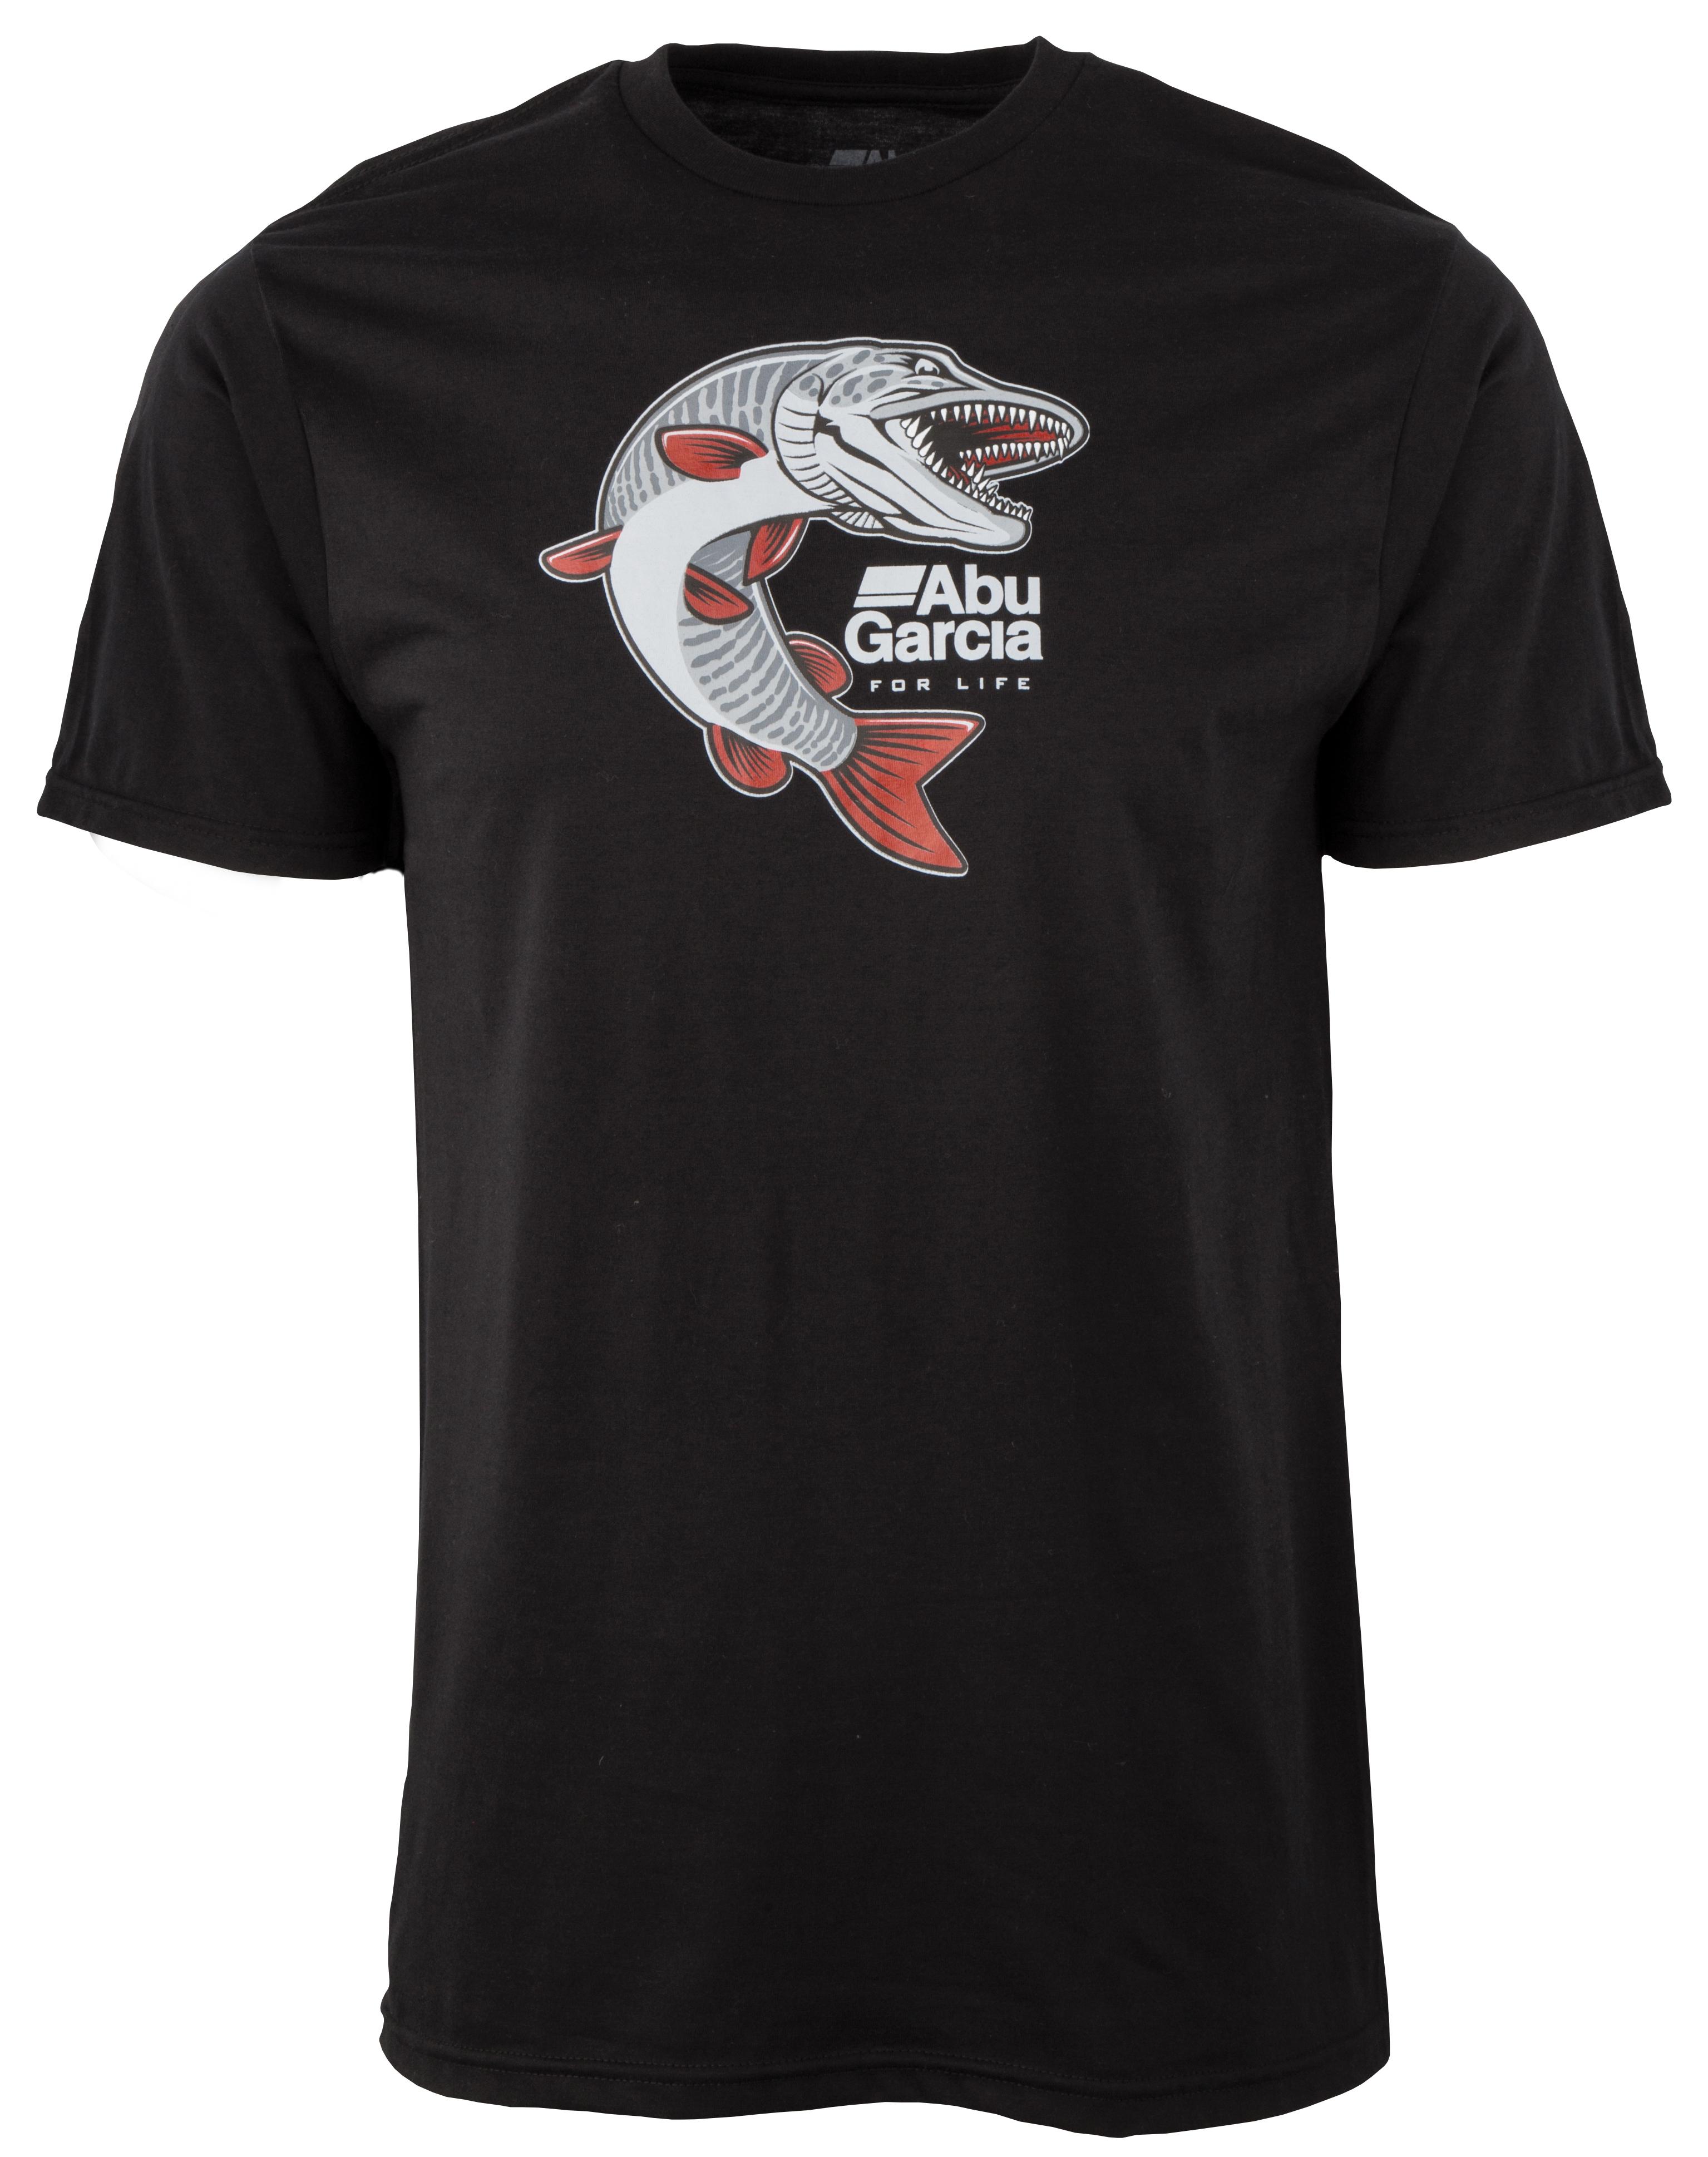 ABU GARCIA T-SHIRT REVO TORO BEAST XL (tričko s krátkým rukávem)